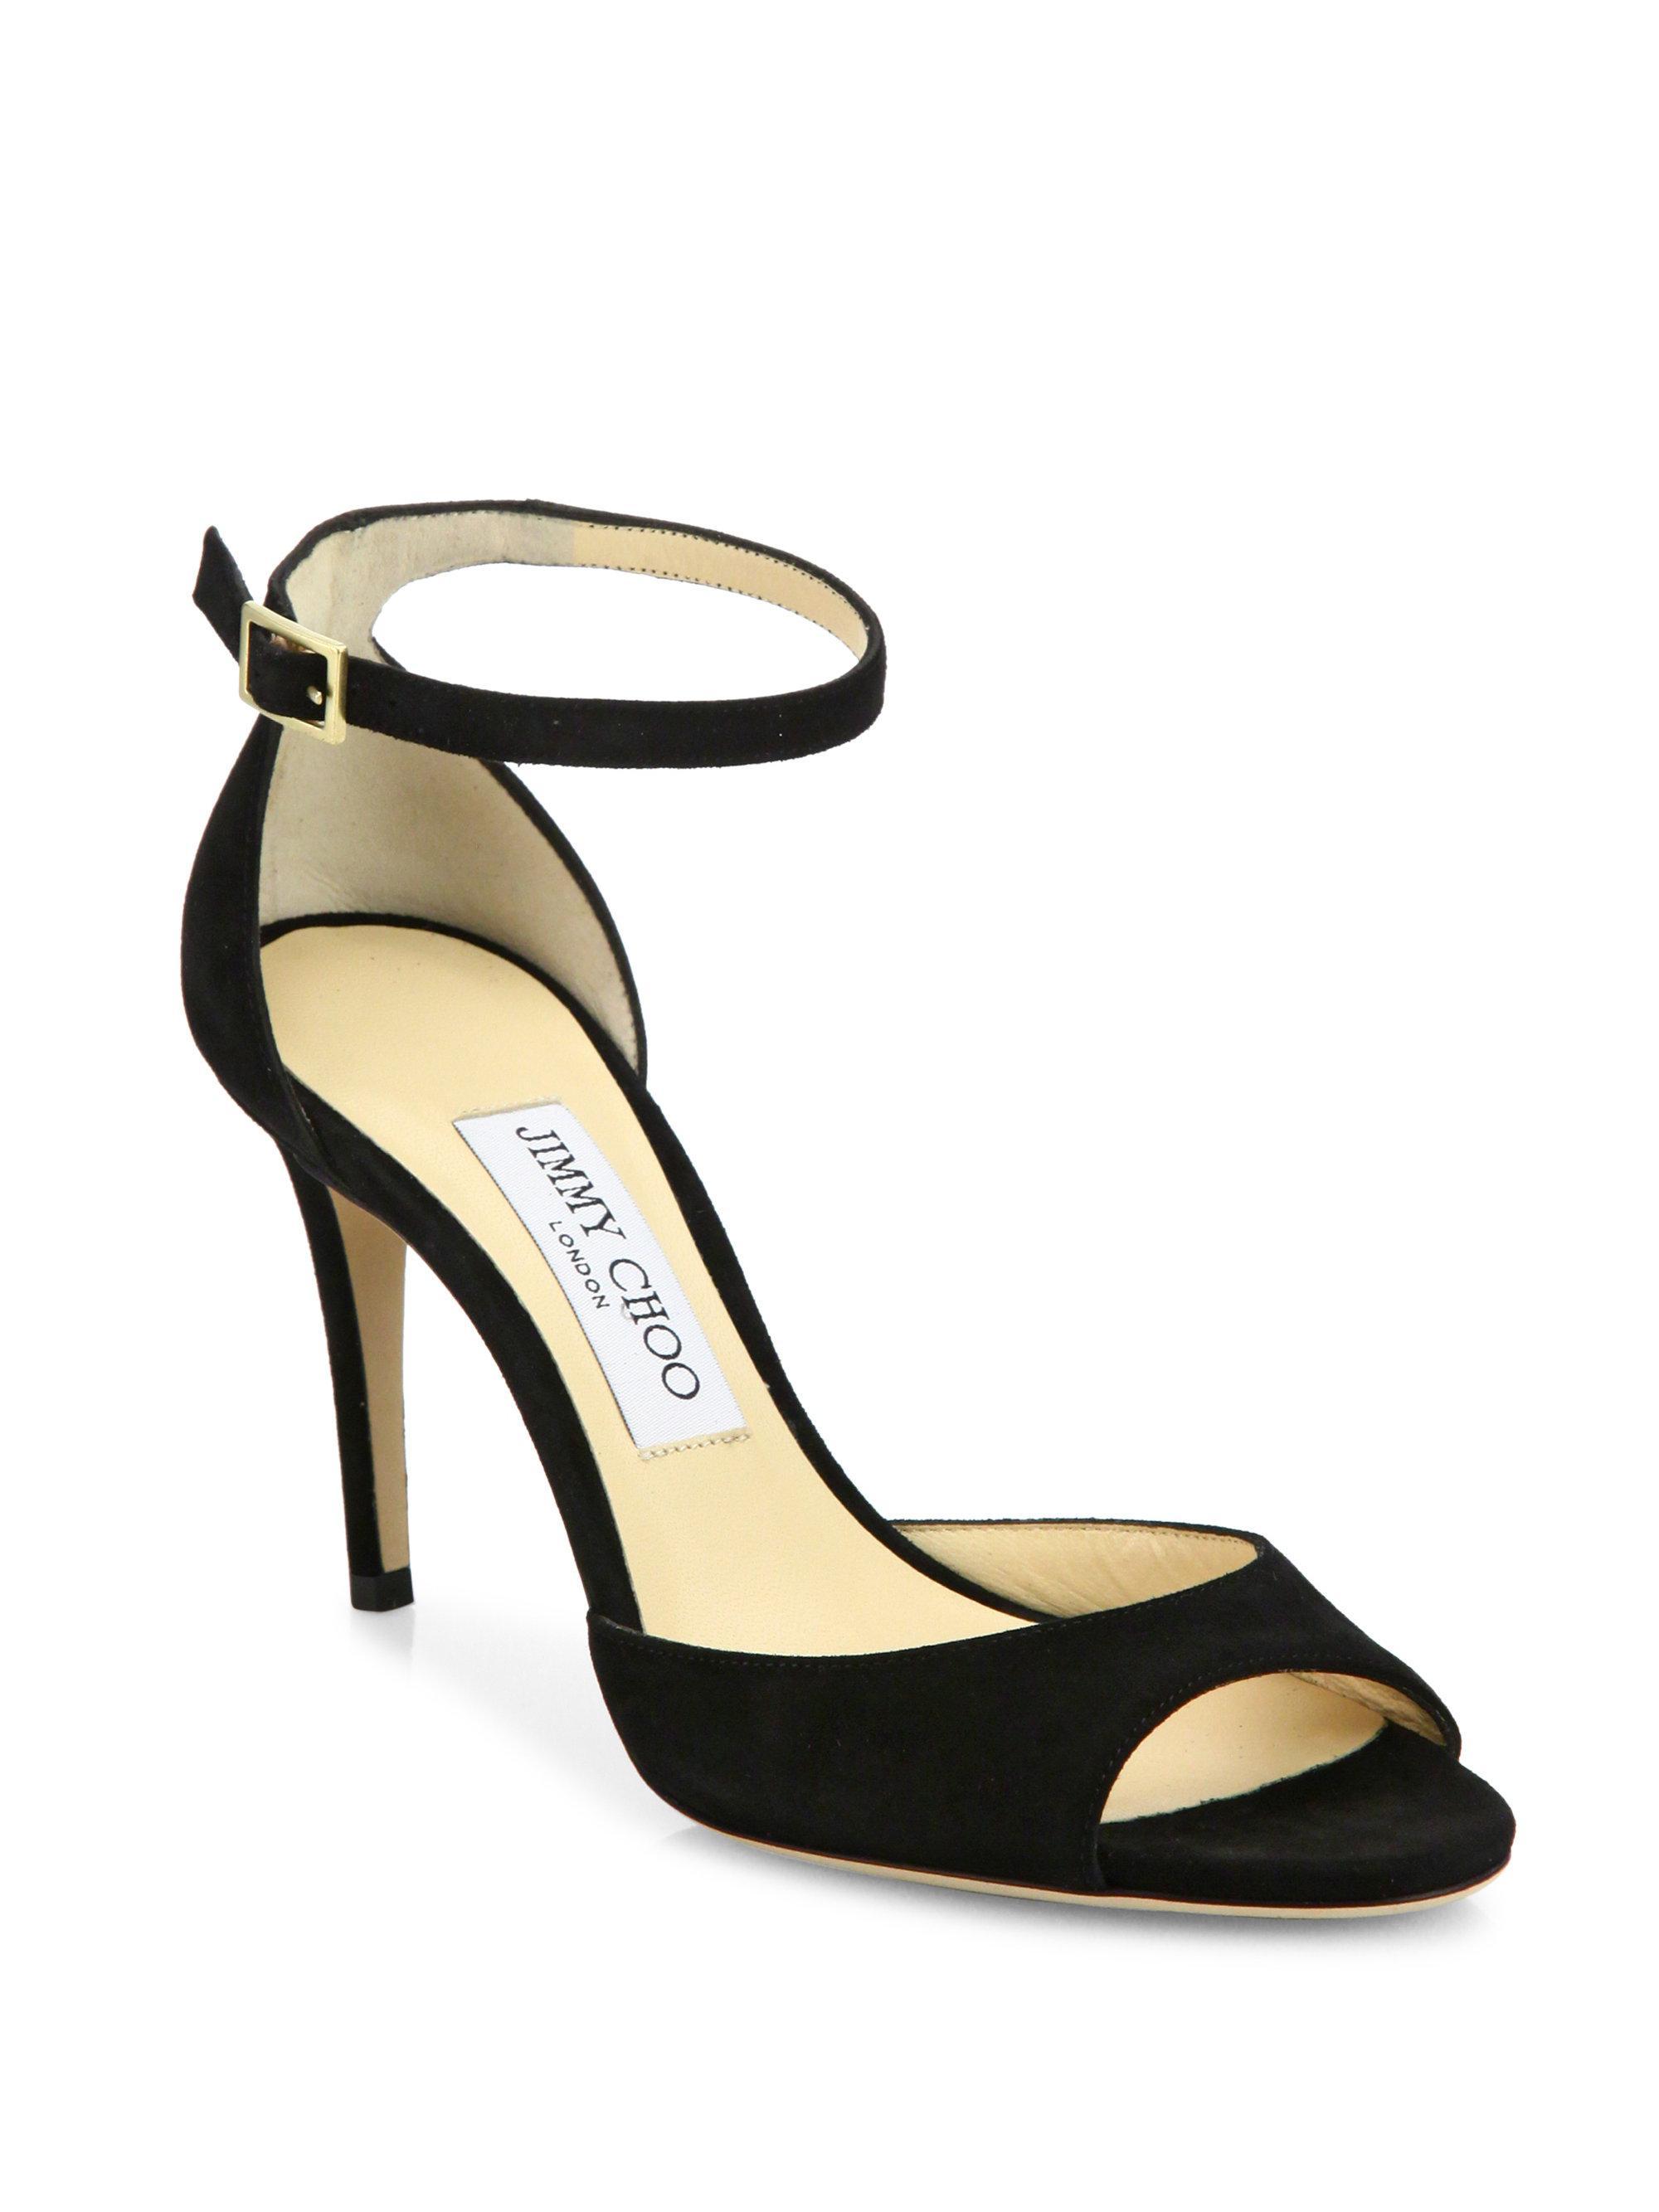 Jimmy choo Annie Glitter d'Orsay Ankle-Strap Sandals gqKWBPT78n